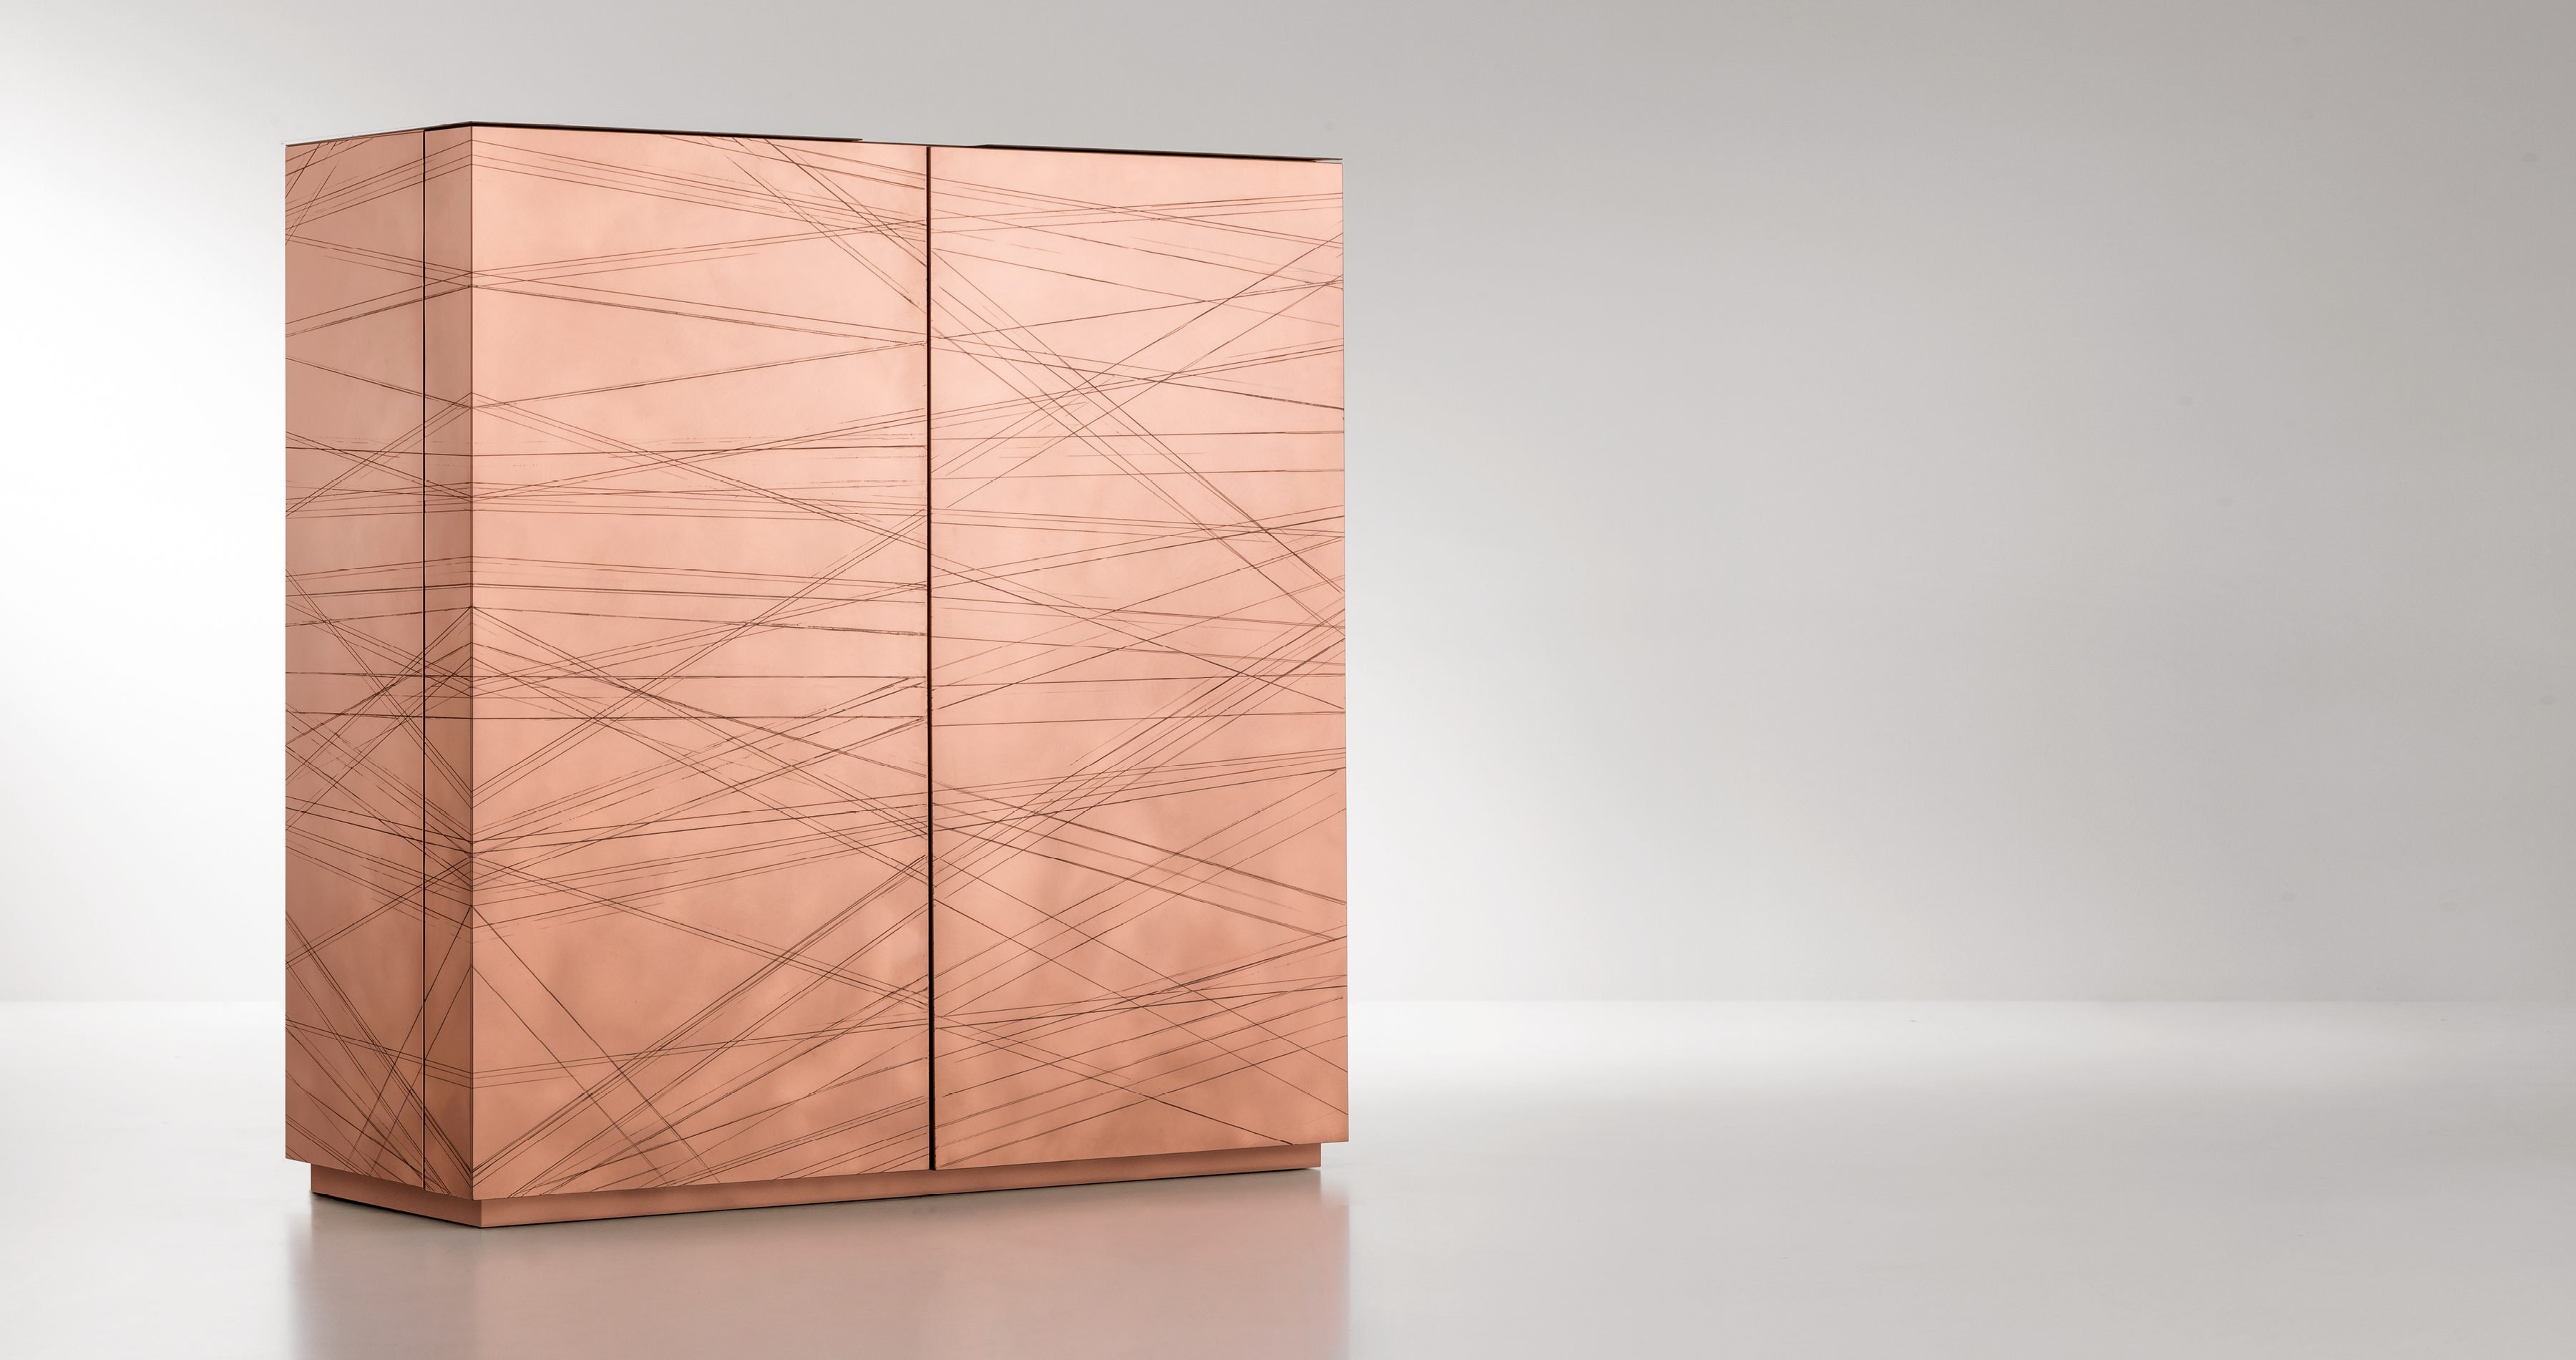 Graffio Cabinets from De Castelli, designed by Paolo Benevelli